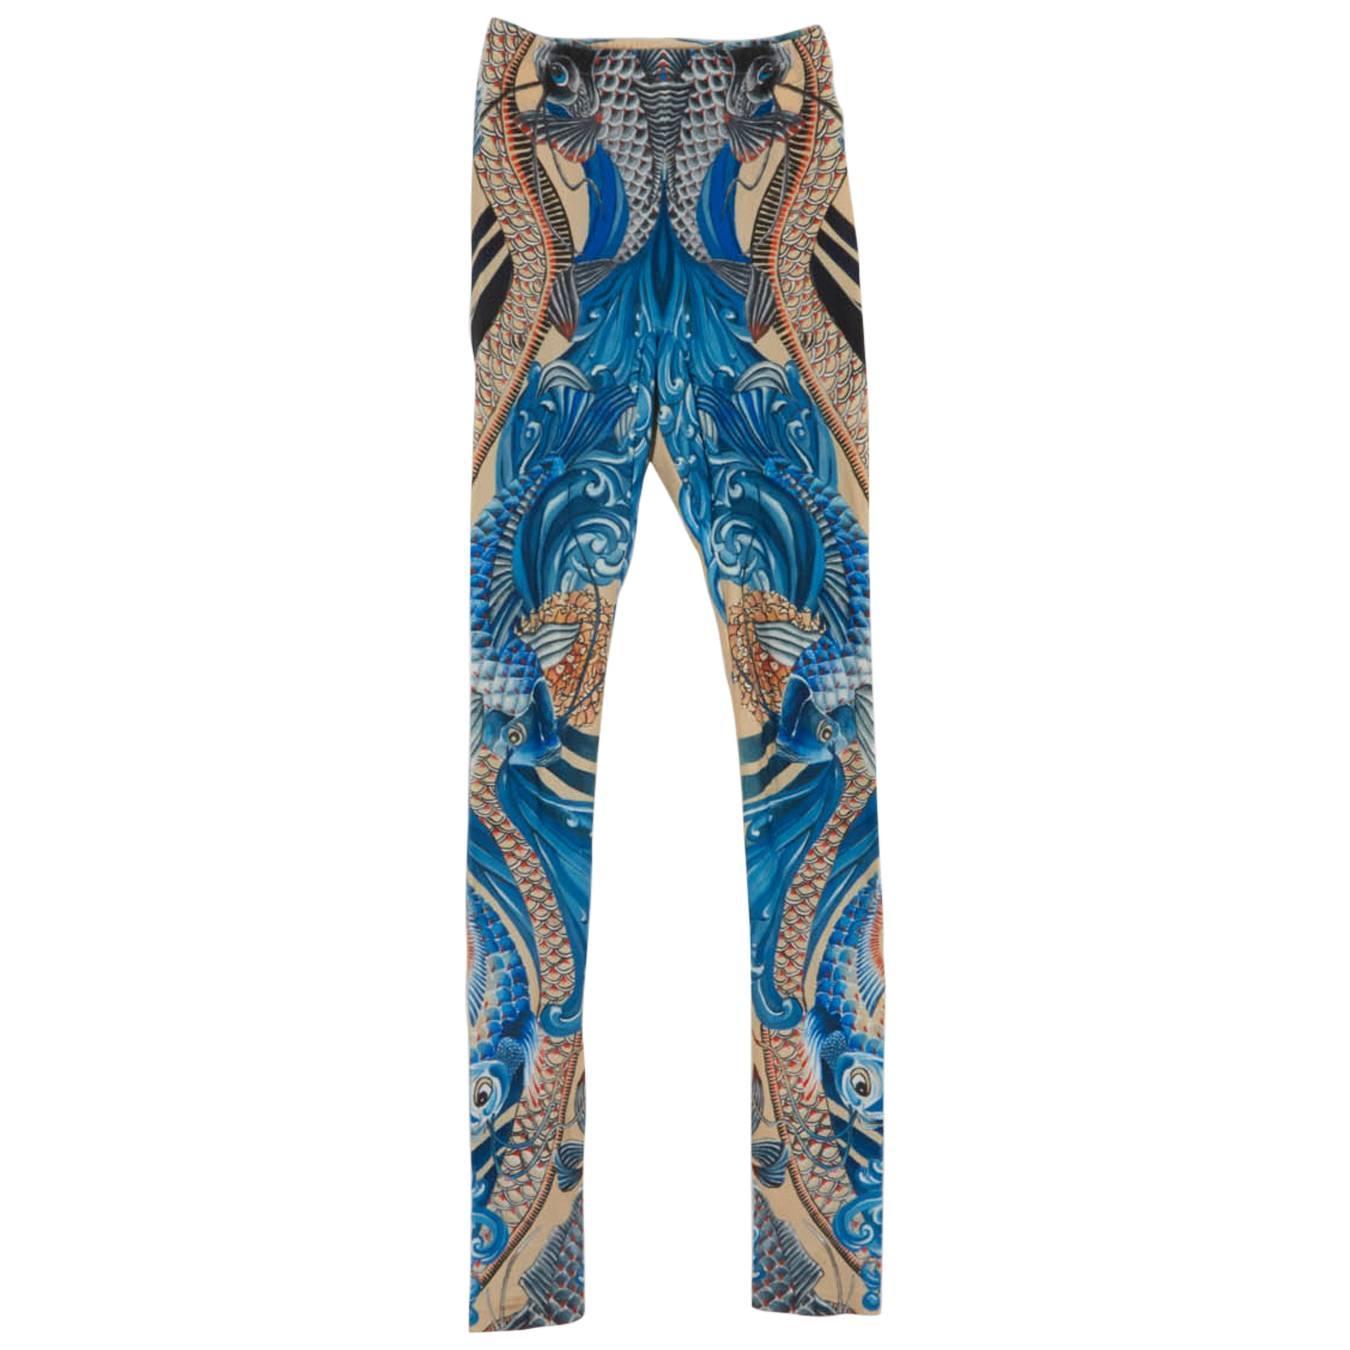 double hem jeans - Blue Alexander McQueen qNODkpeqN